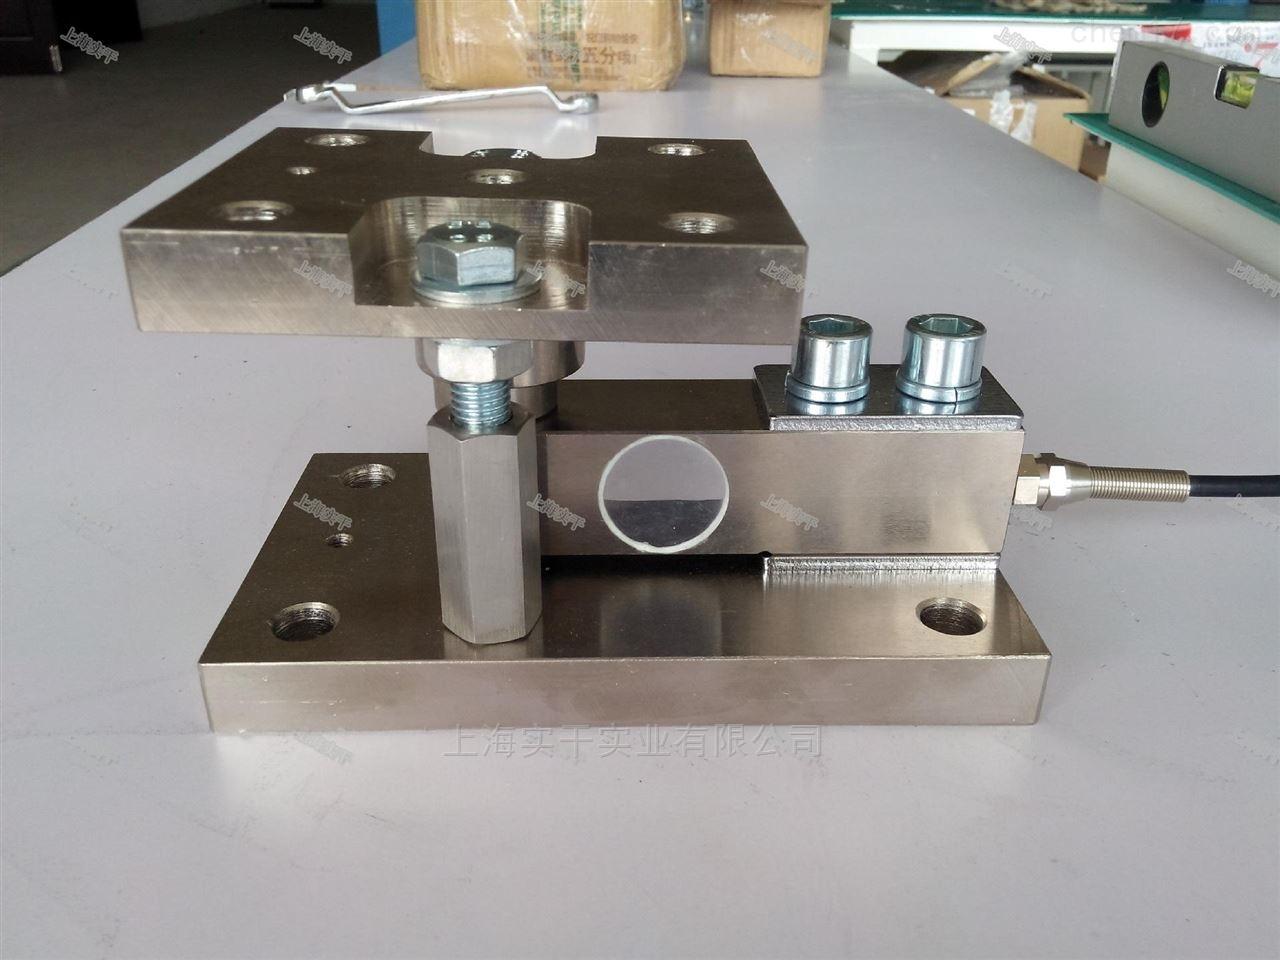 10T称重式液罐计量仪生产厂家